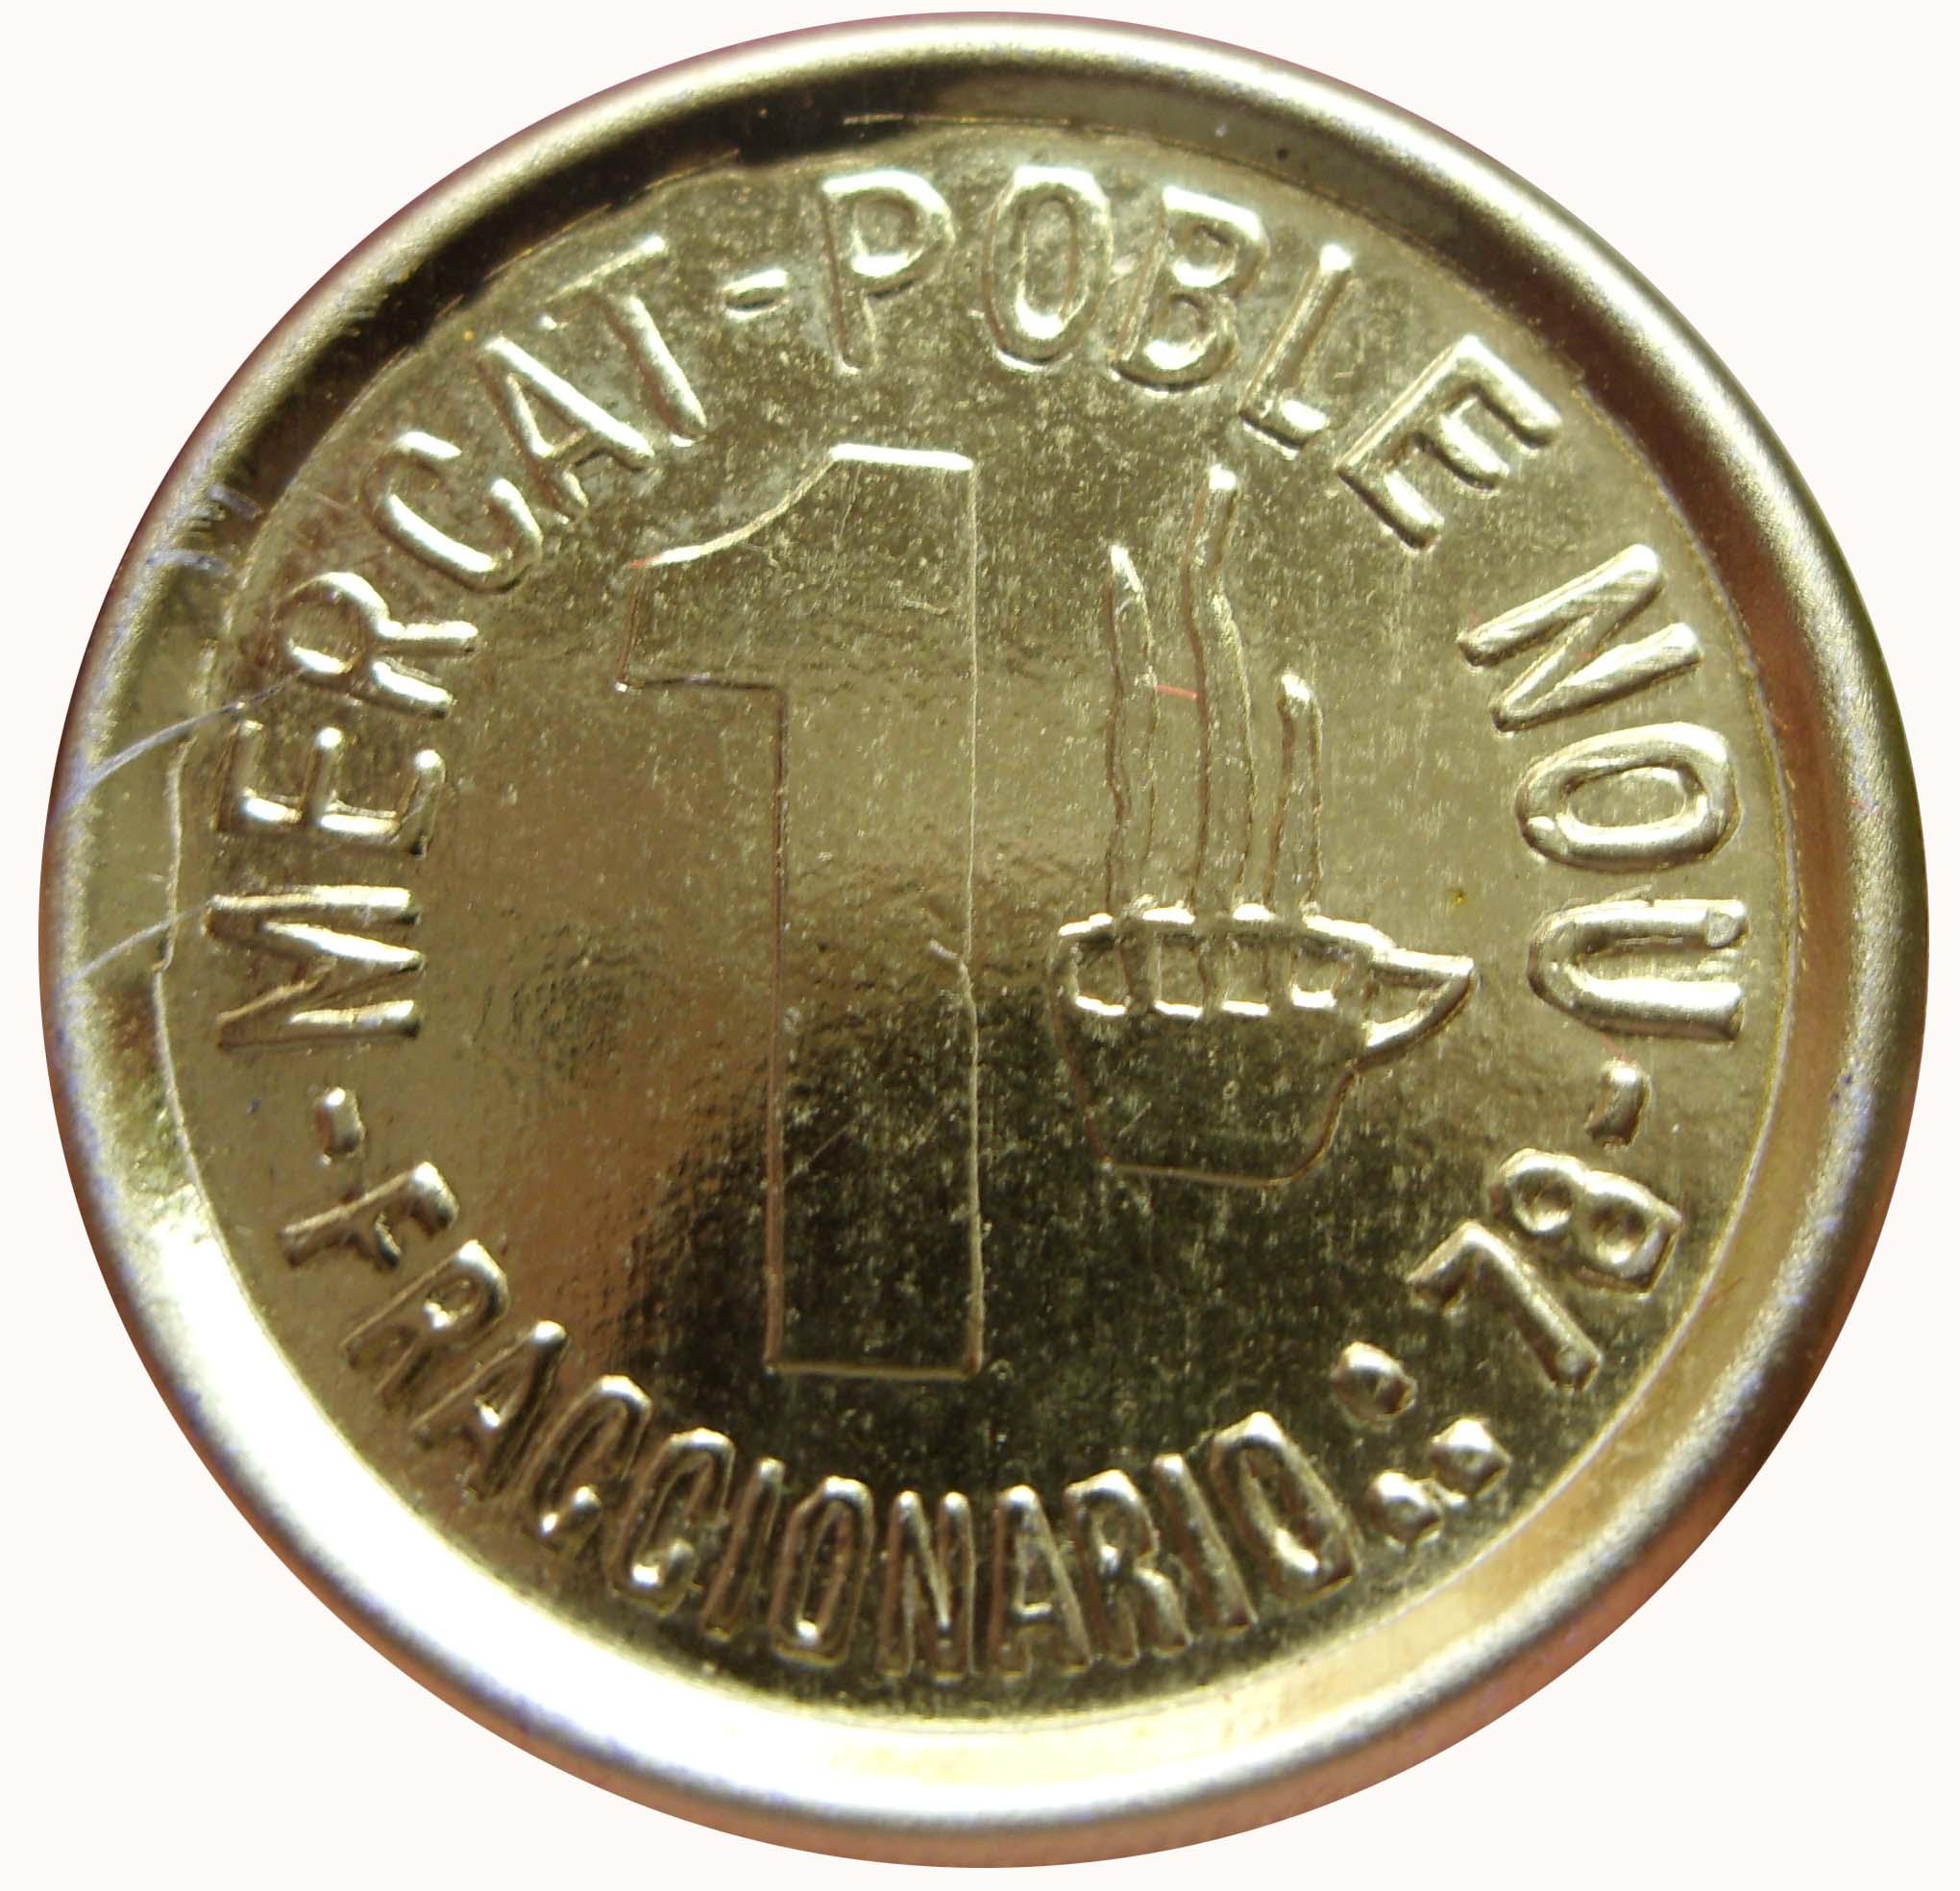 POBLE NOU 1810